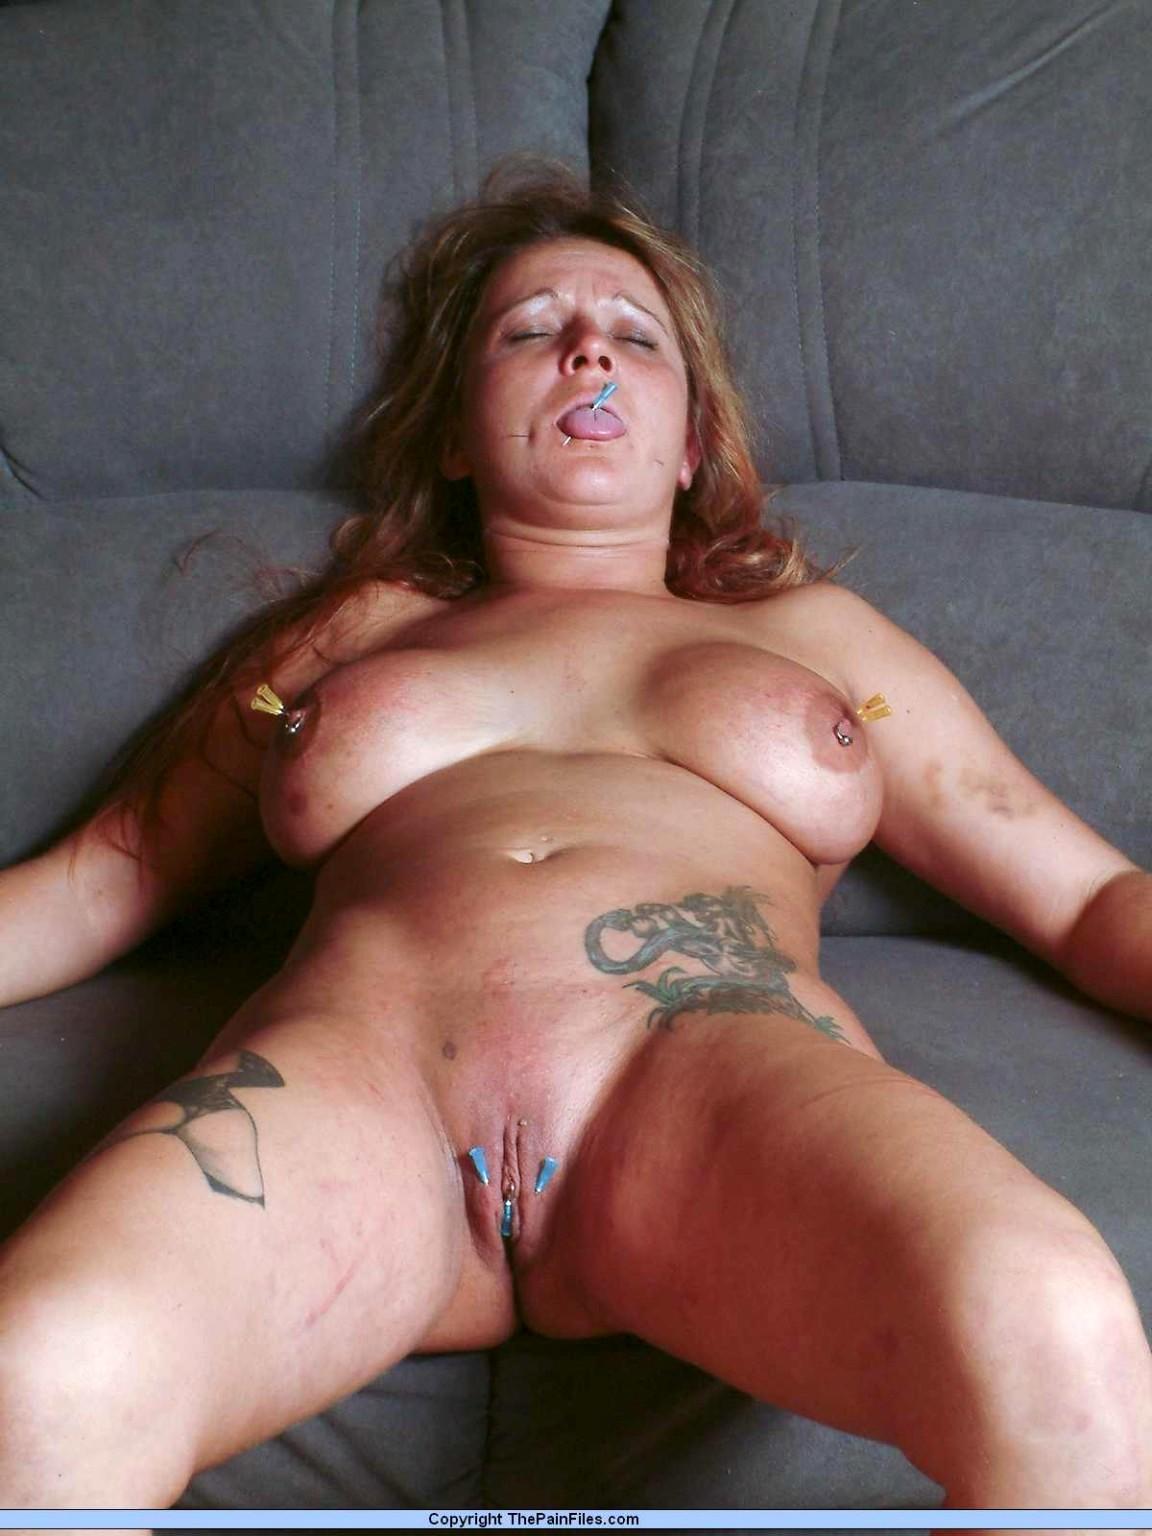 Bonnie rockwaller hentai fuck bdsm toon porn